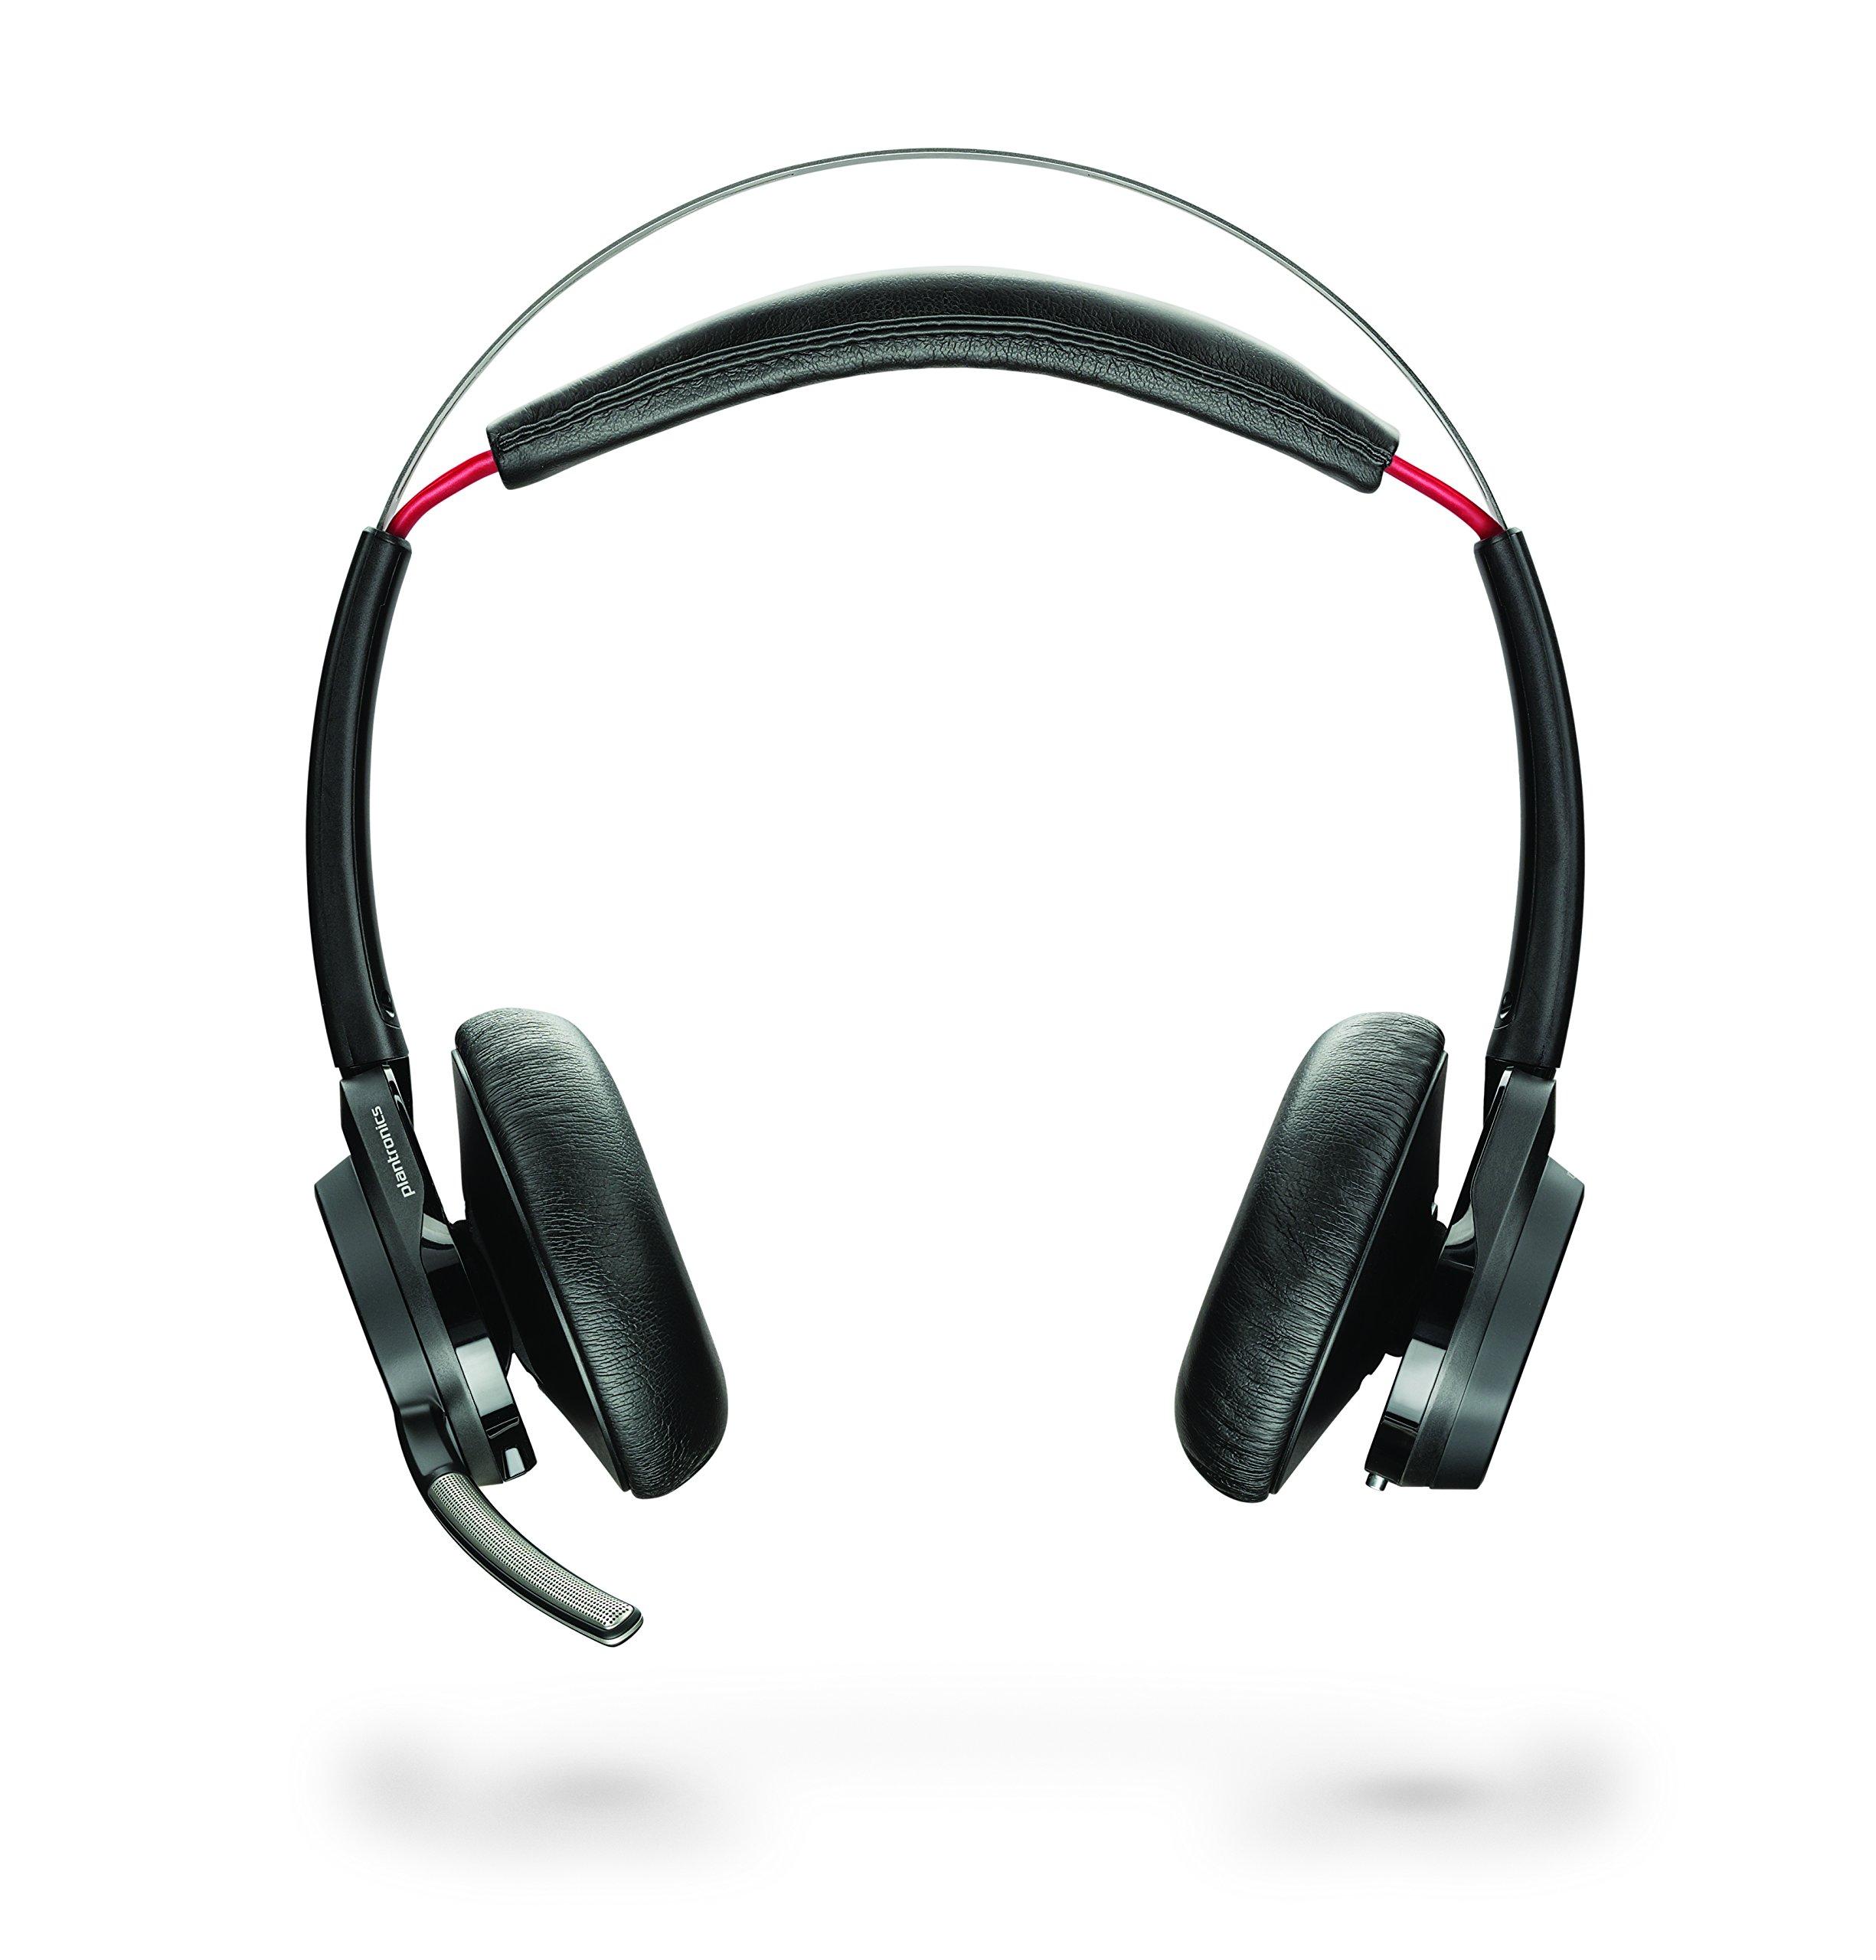 Auriculares Plantronics Voyager Focus Uc Stereo Bluetooth Headset Con Cancelacion De Ruido Activa (anc)